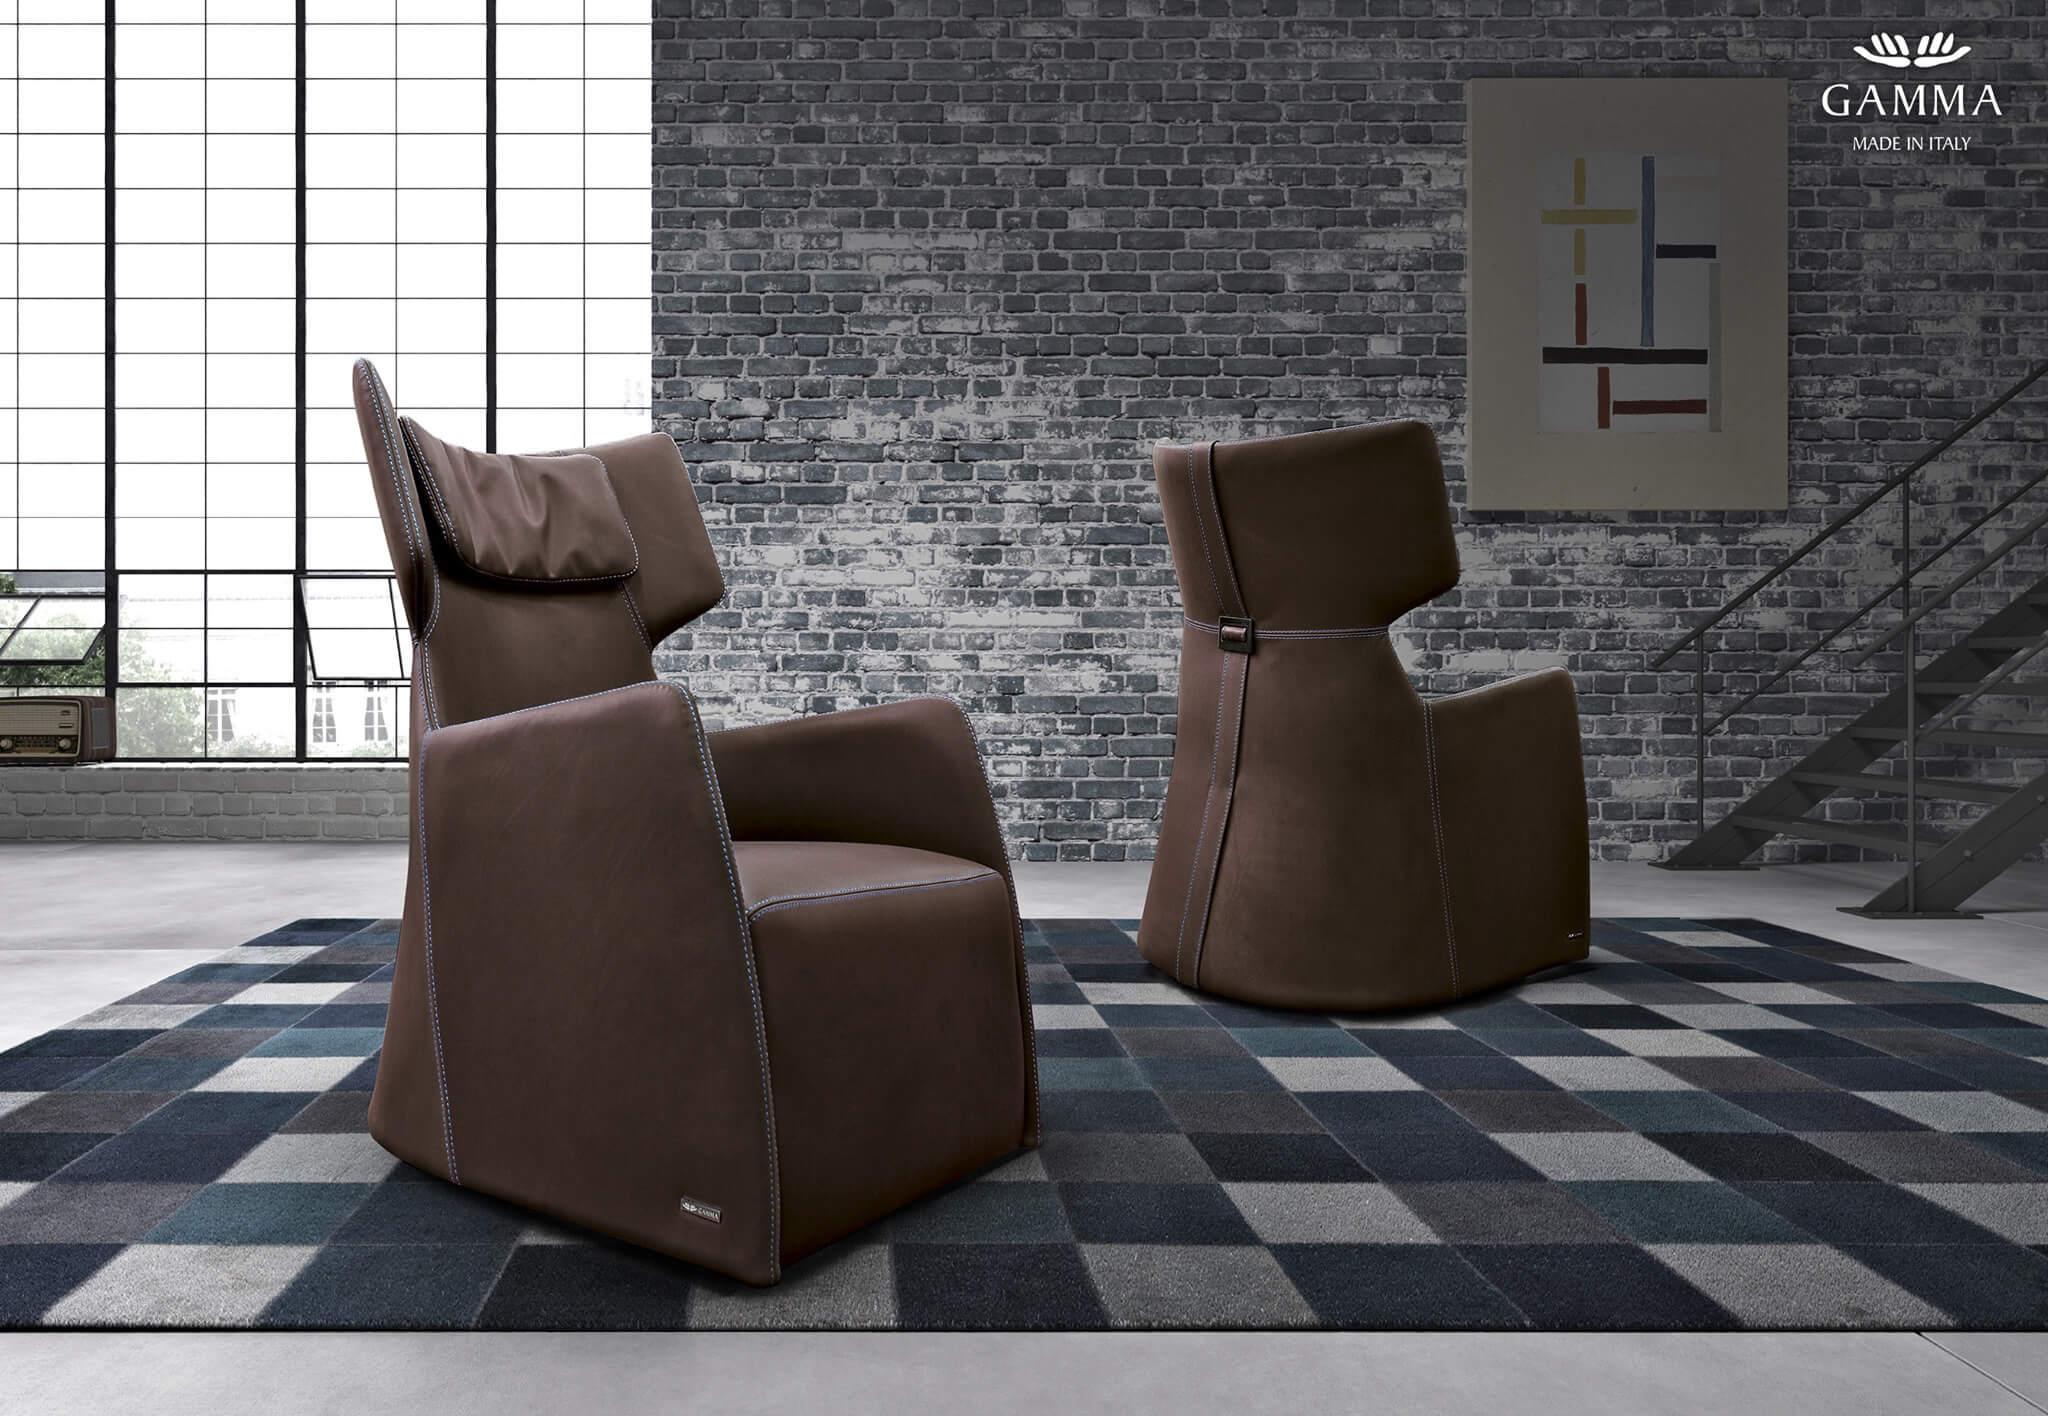 GAMMA義大利皮革單椅